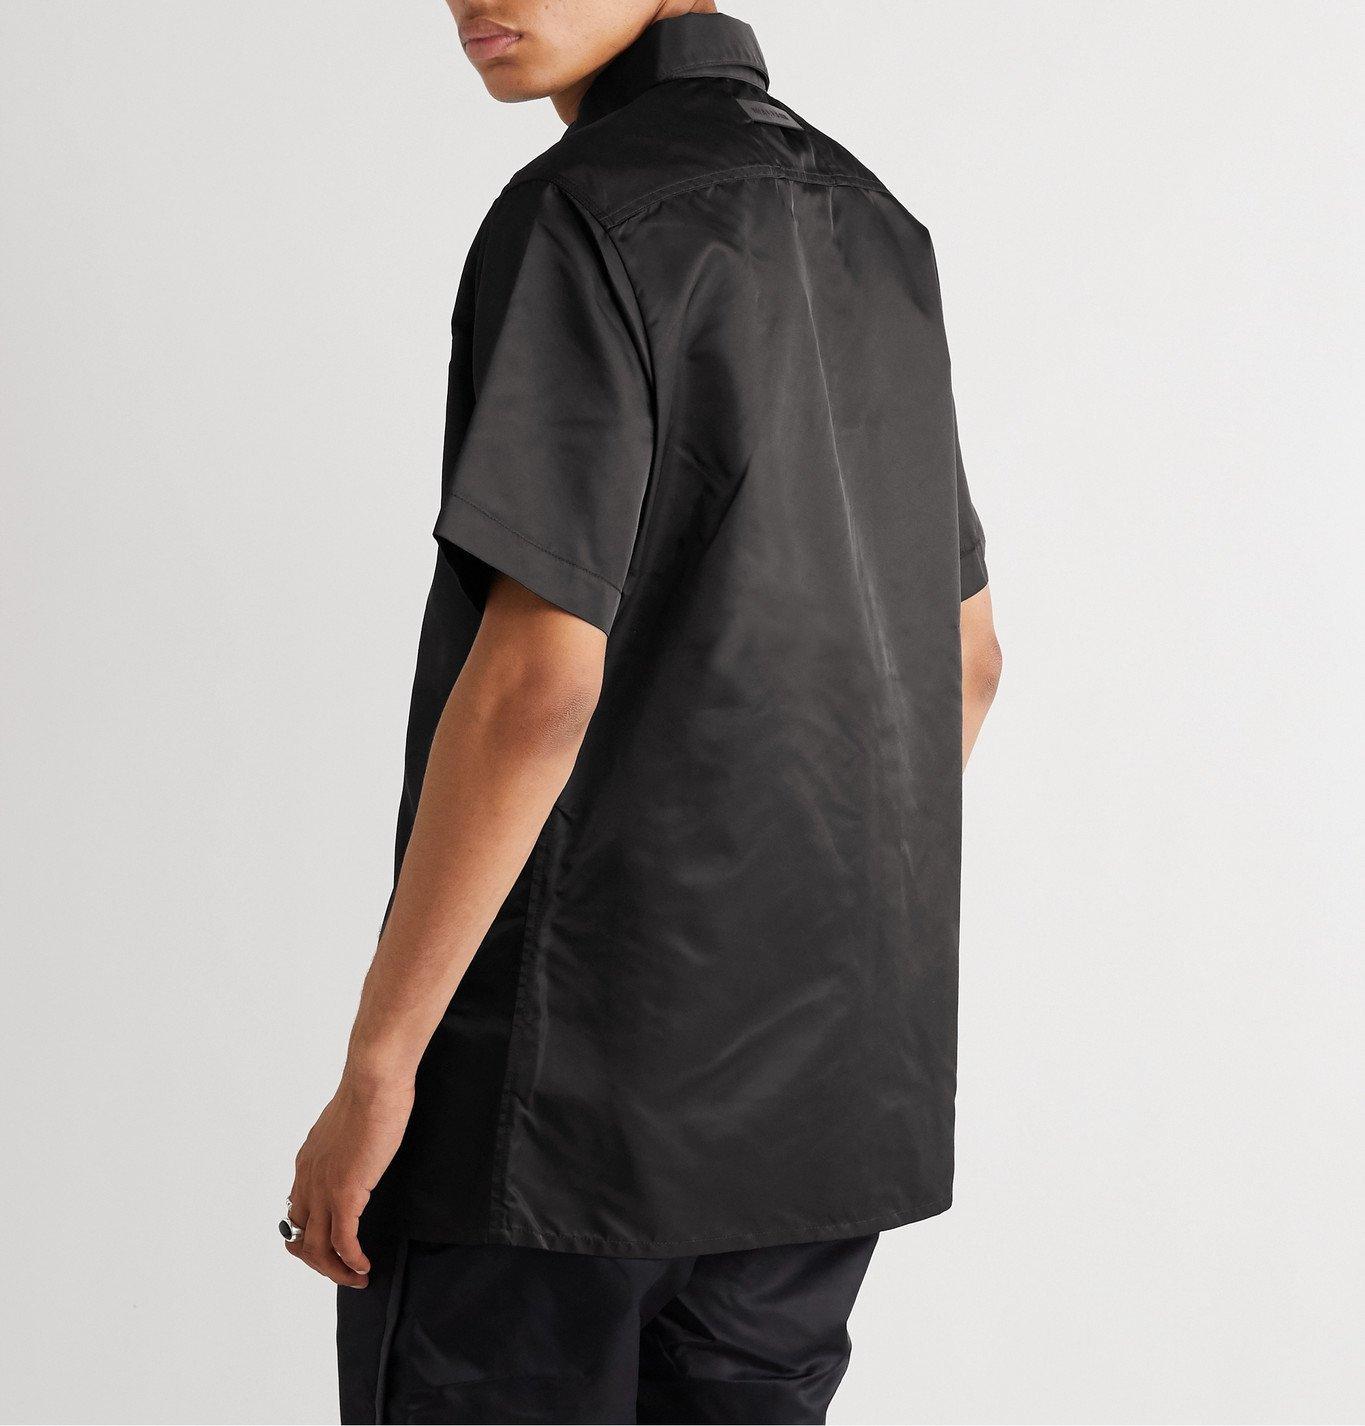 1017 ALYX 9SM - Buckle-Detailed Nylon Shirt - Black